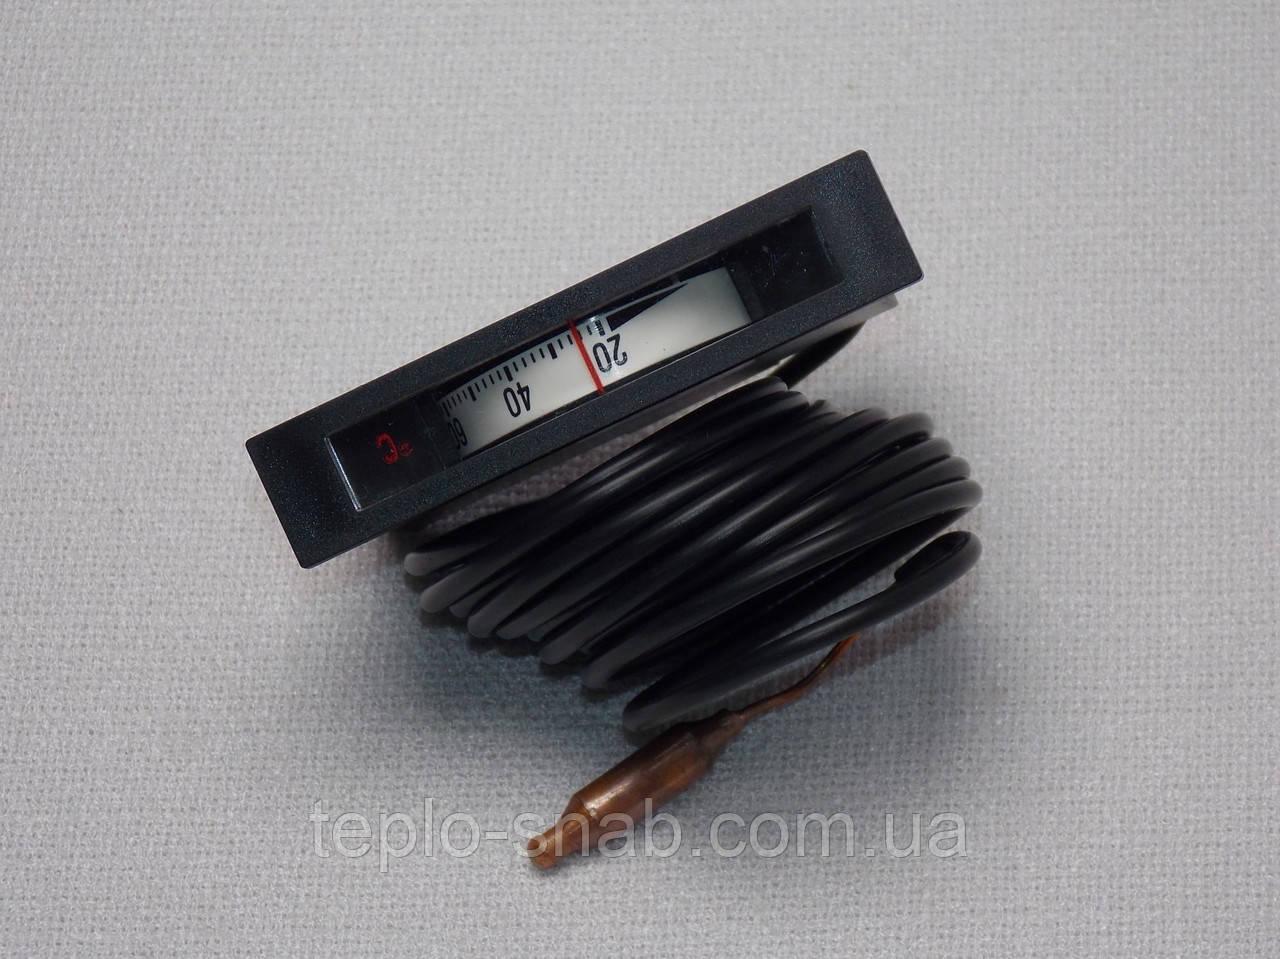 Термометр газового котла Junkers/Bosch Supraline K ...- 8E / EC. 8729010489